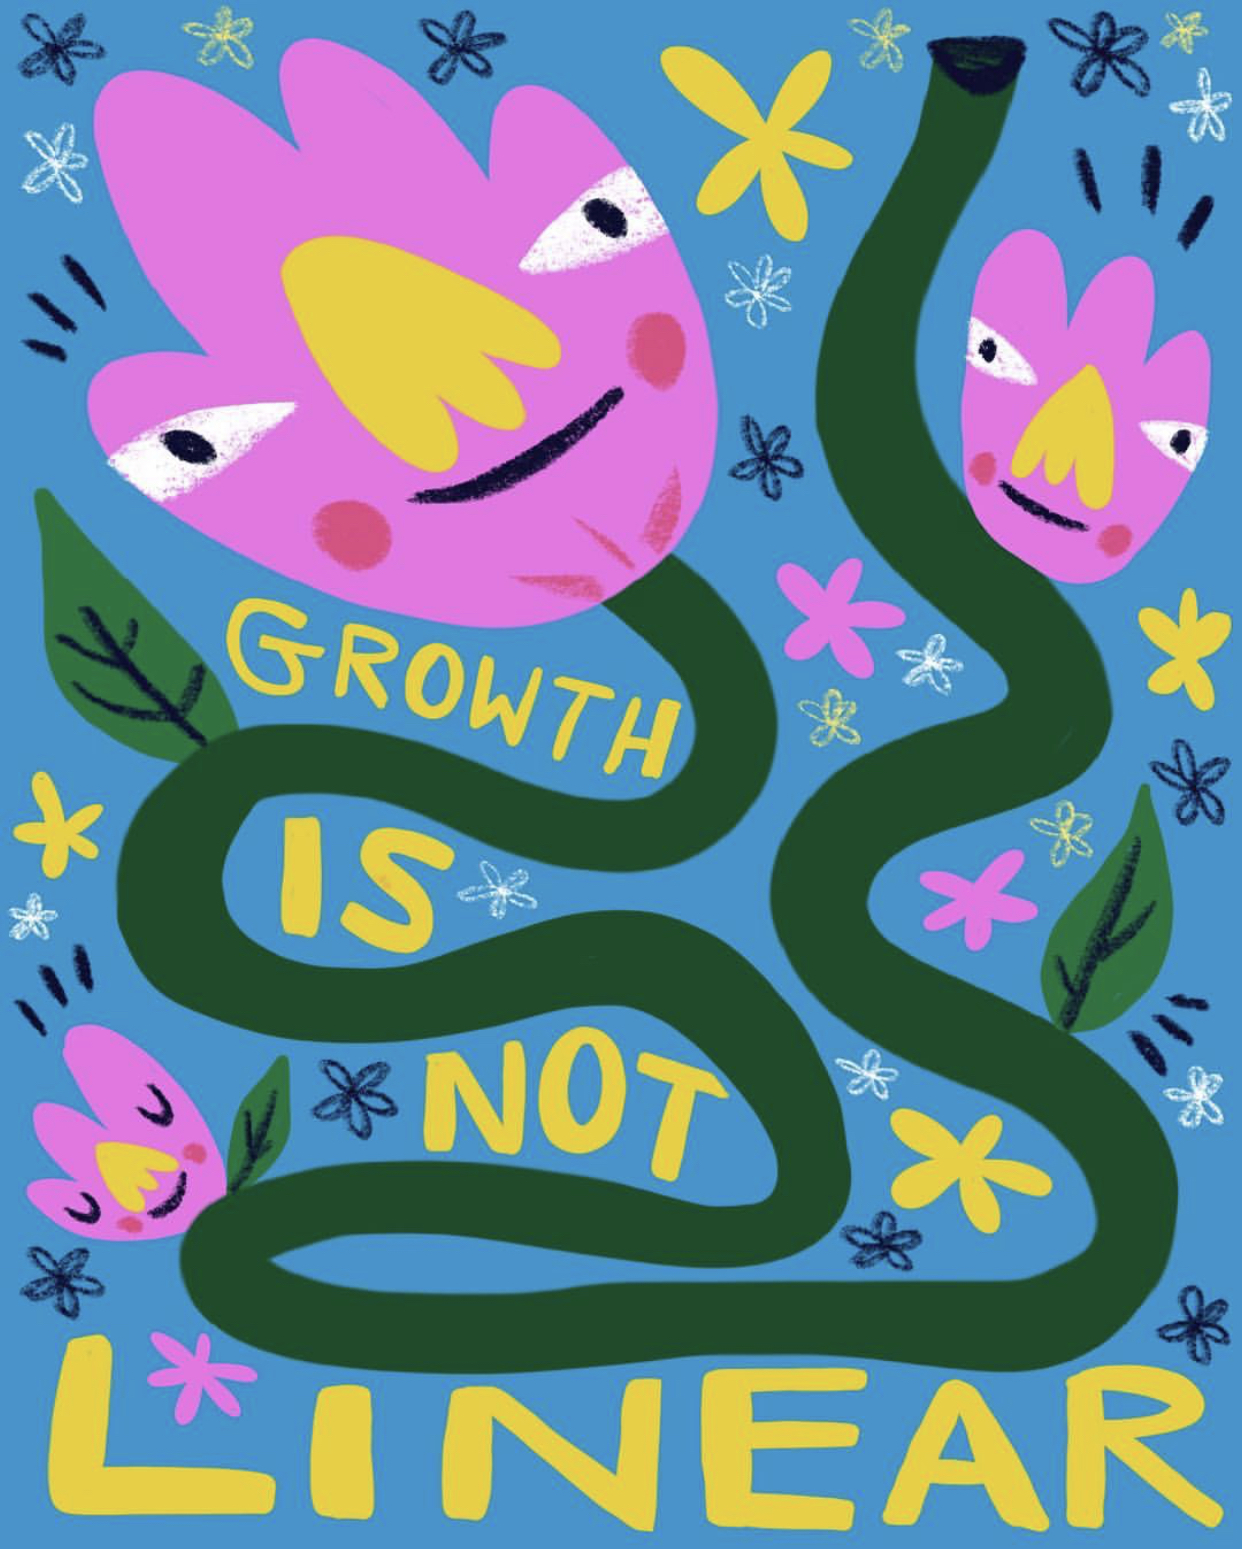 Illustration courtesy of Barry Lee, Cover Photo courtesy of Ambar Navarro